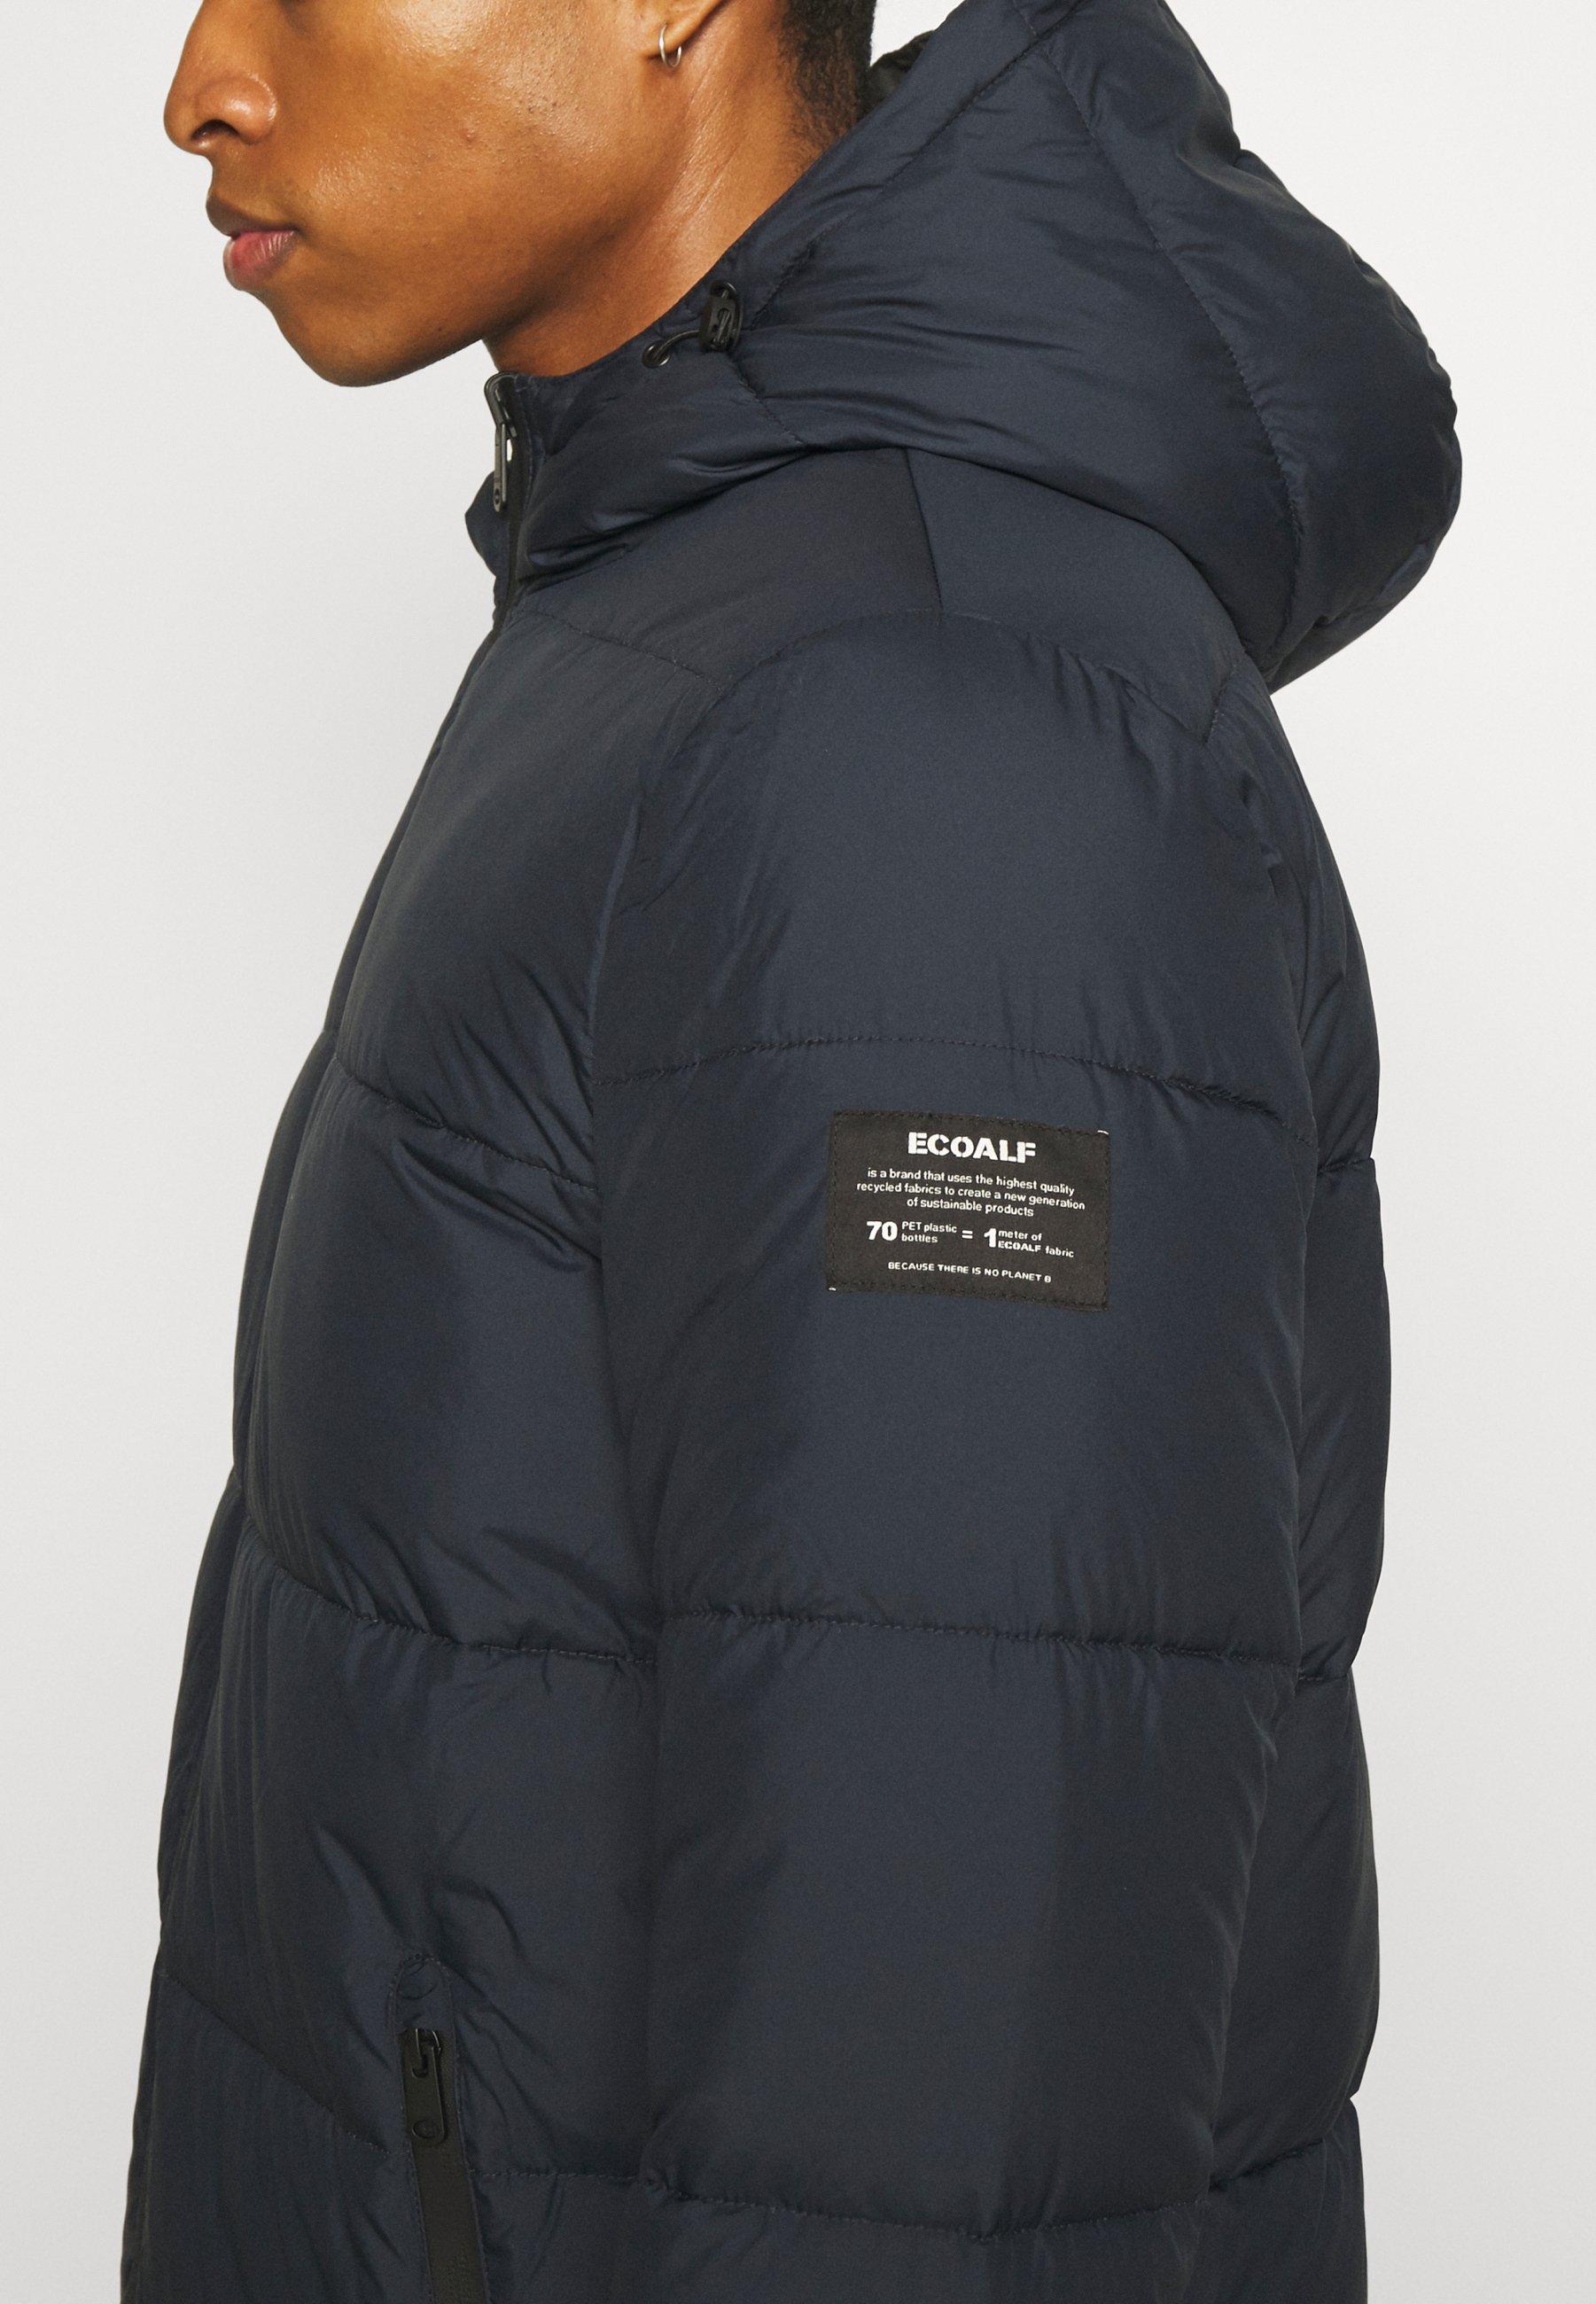 Homme VINTAGALF REVERSIBLE JACKET MAN - Veste d'hiver